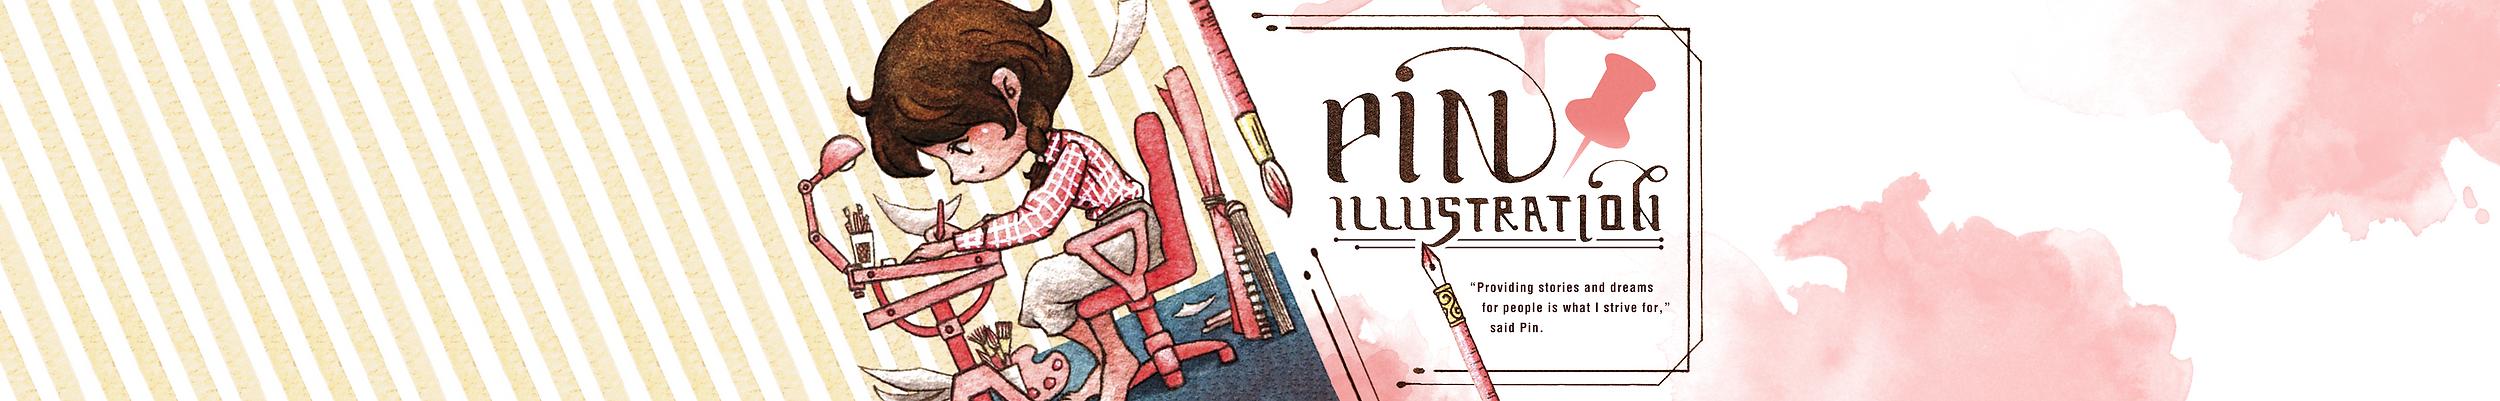 Pin illustration